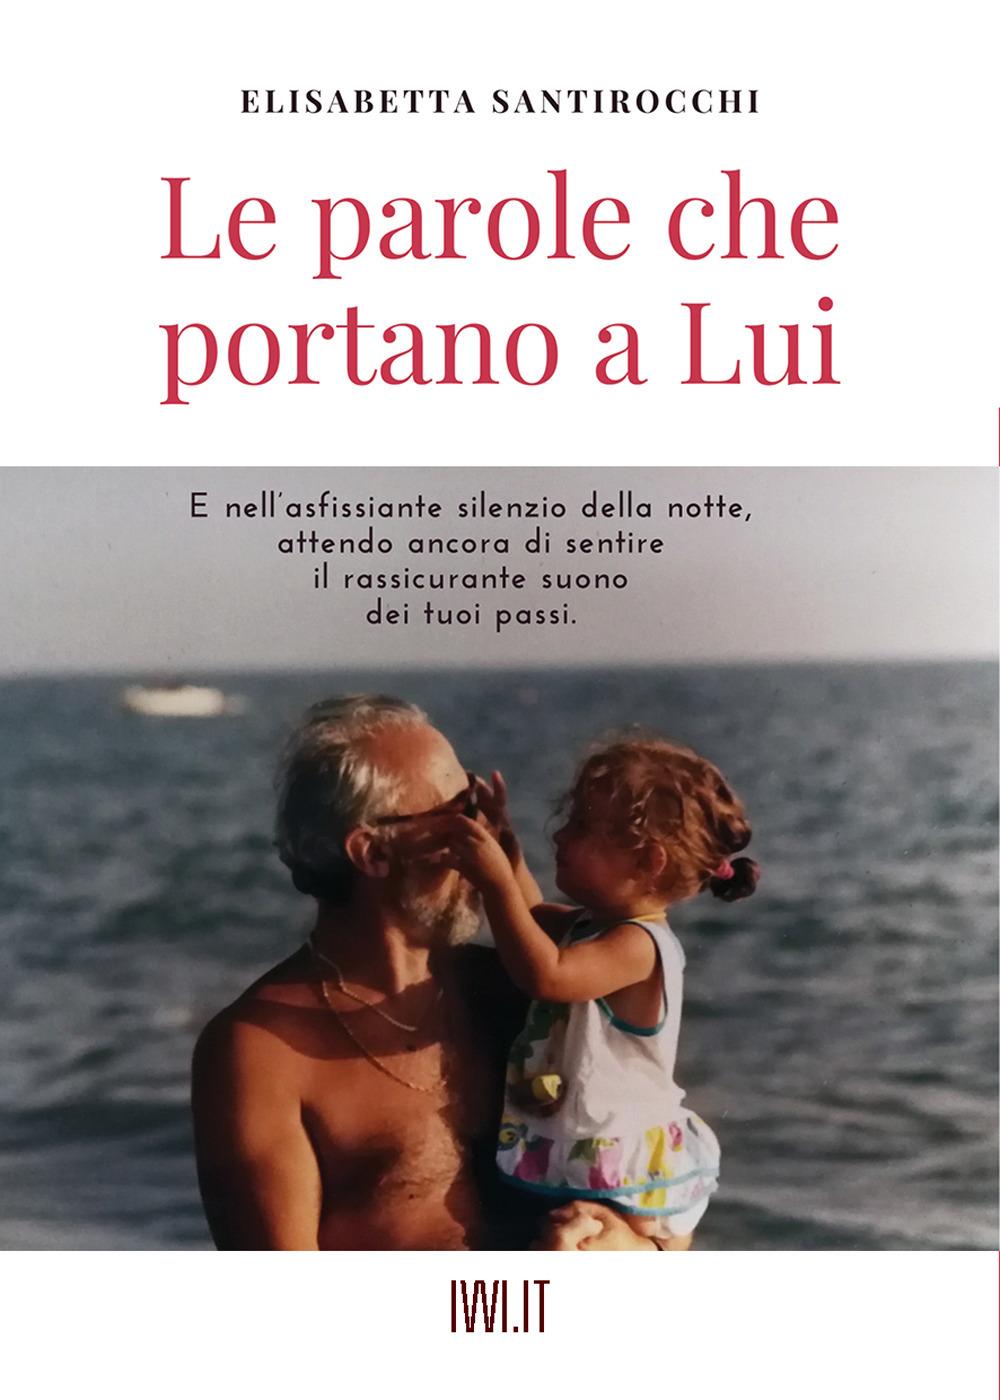 PAROLE CHE PORTANO A LUI (LE) - Santirocchi Elisabetta - 9791280012265